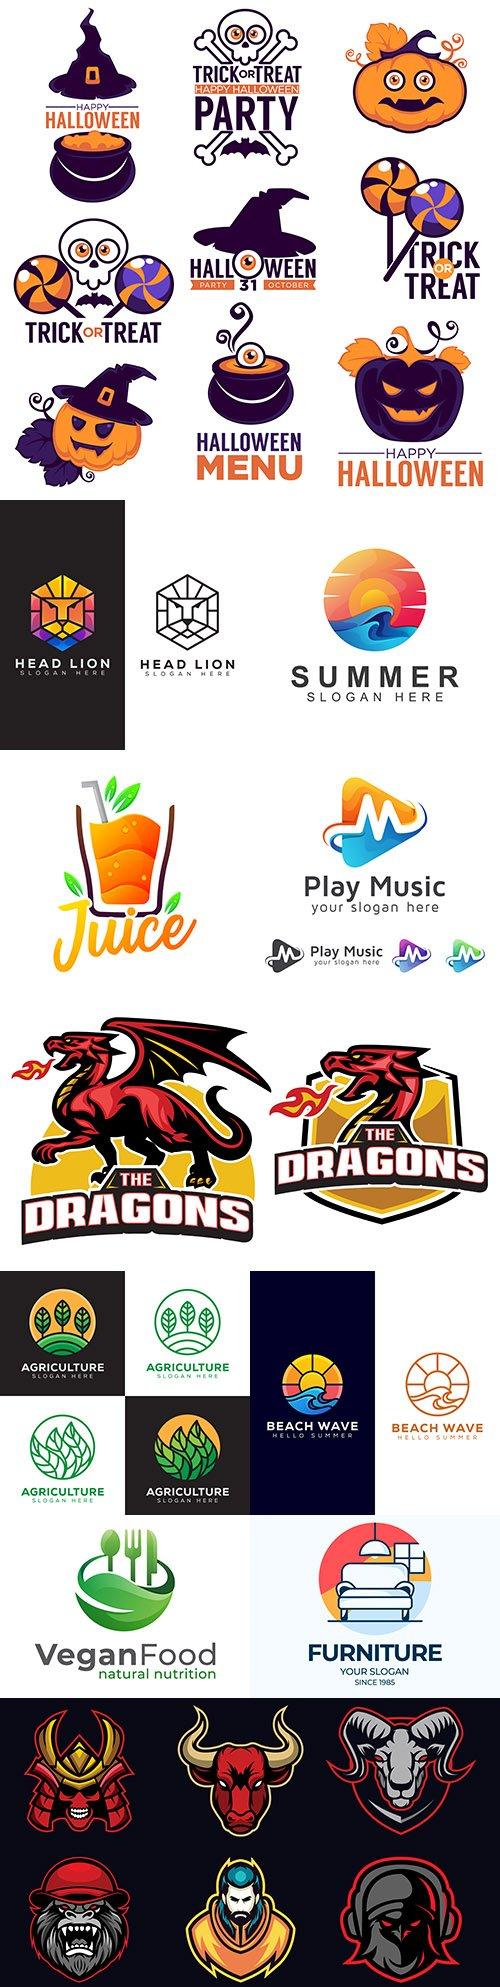 Brand name company logos business corporate design 33